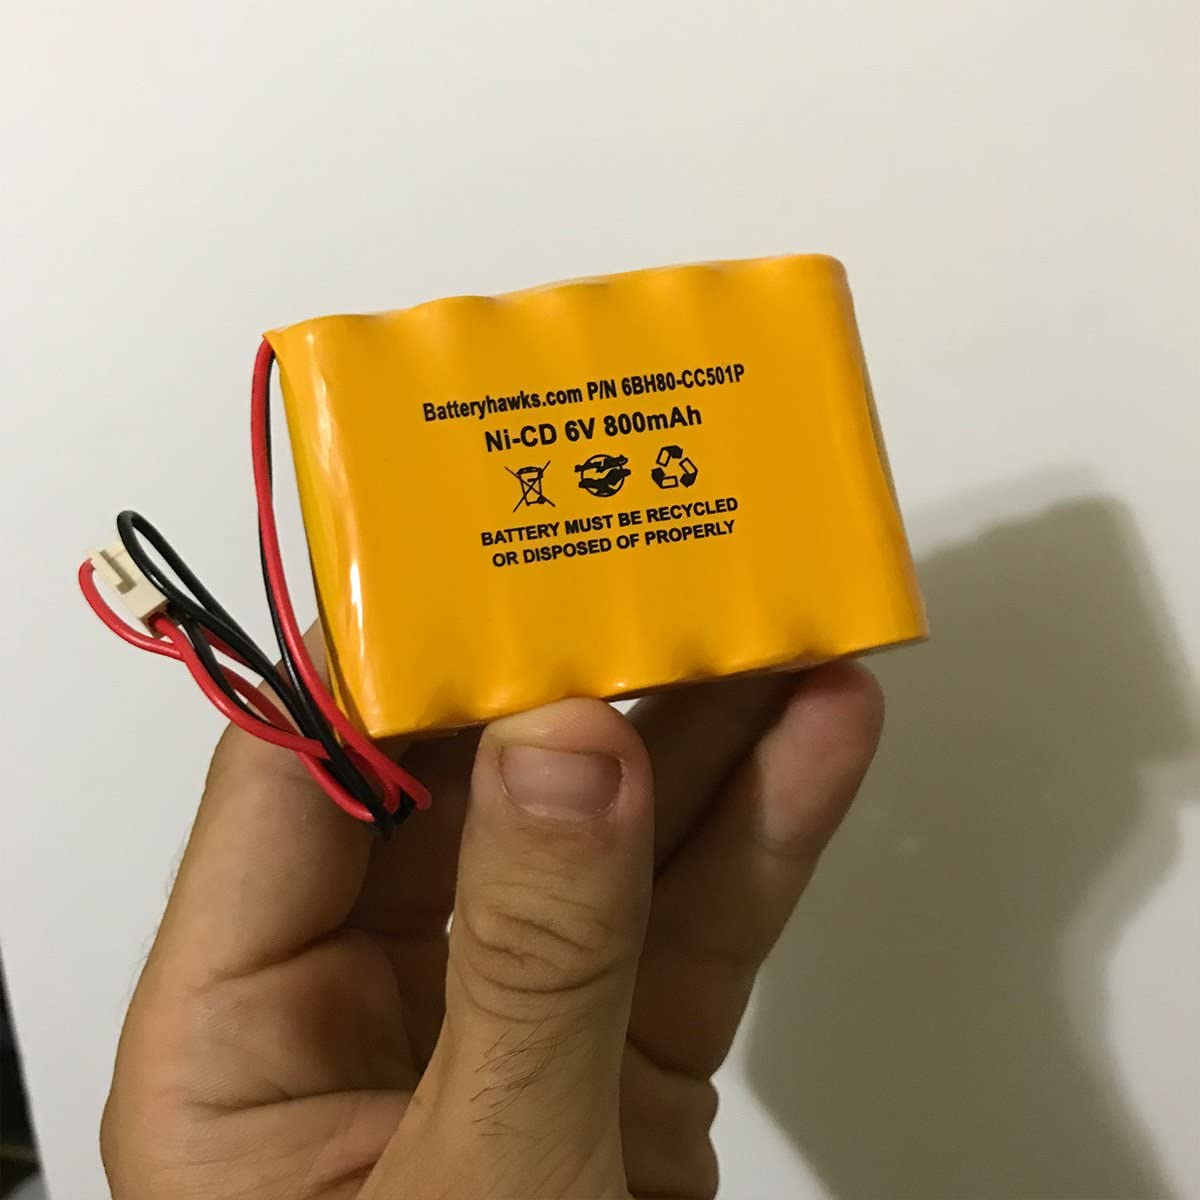 Saft 705105 Emergi-Lite 0018701 EmergiLite 6v 800mAh Ni-CD Battery Pack Replacement for Exit Sign Emergency Light 850.0054 850.0035